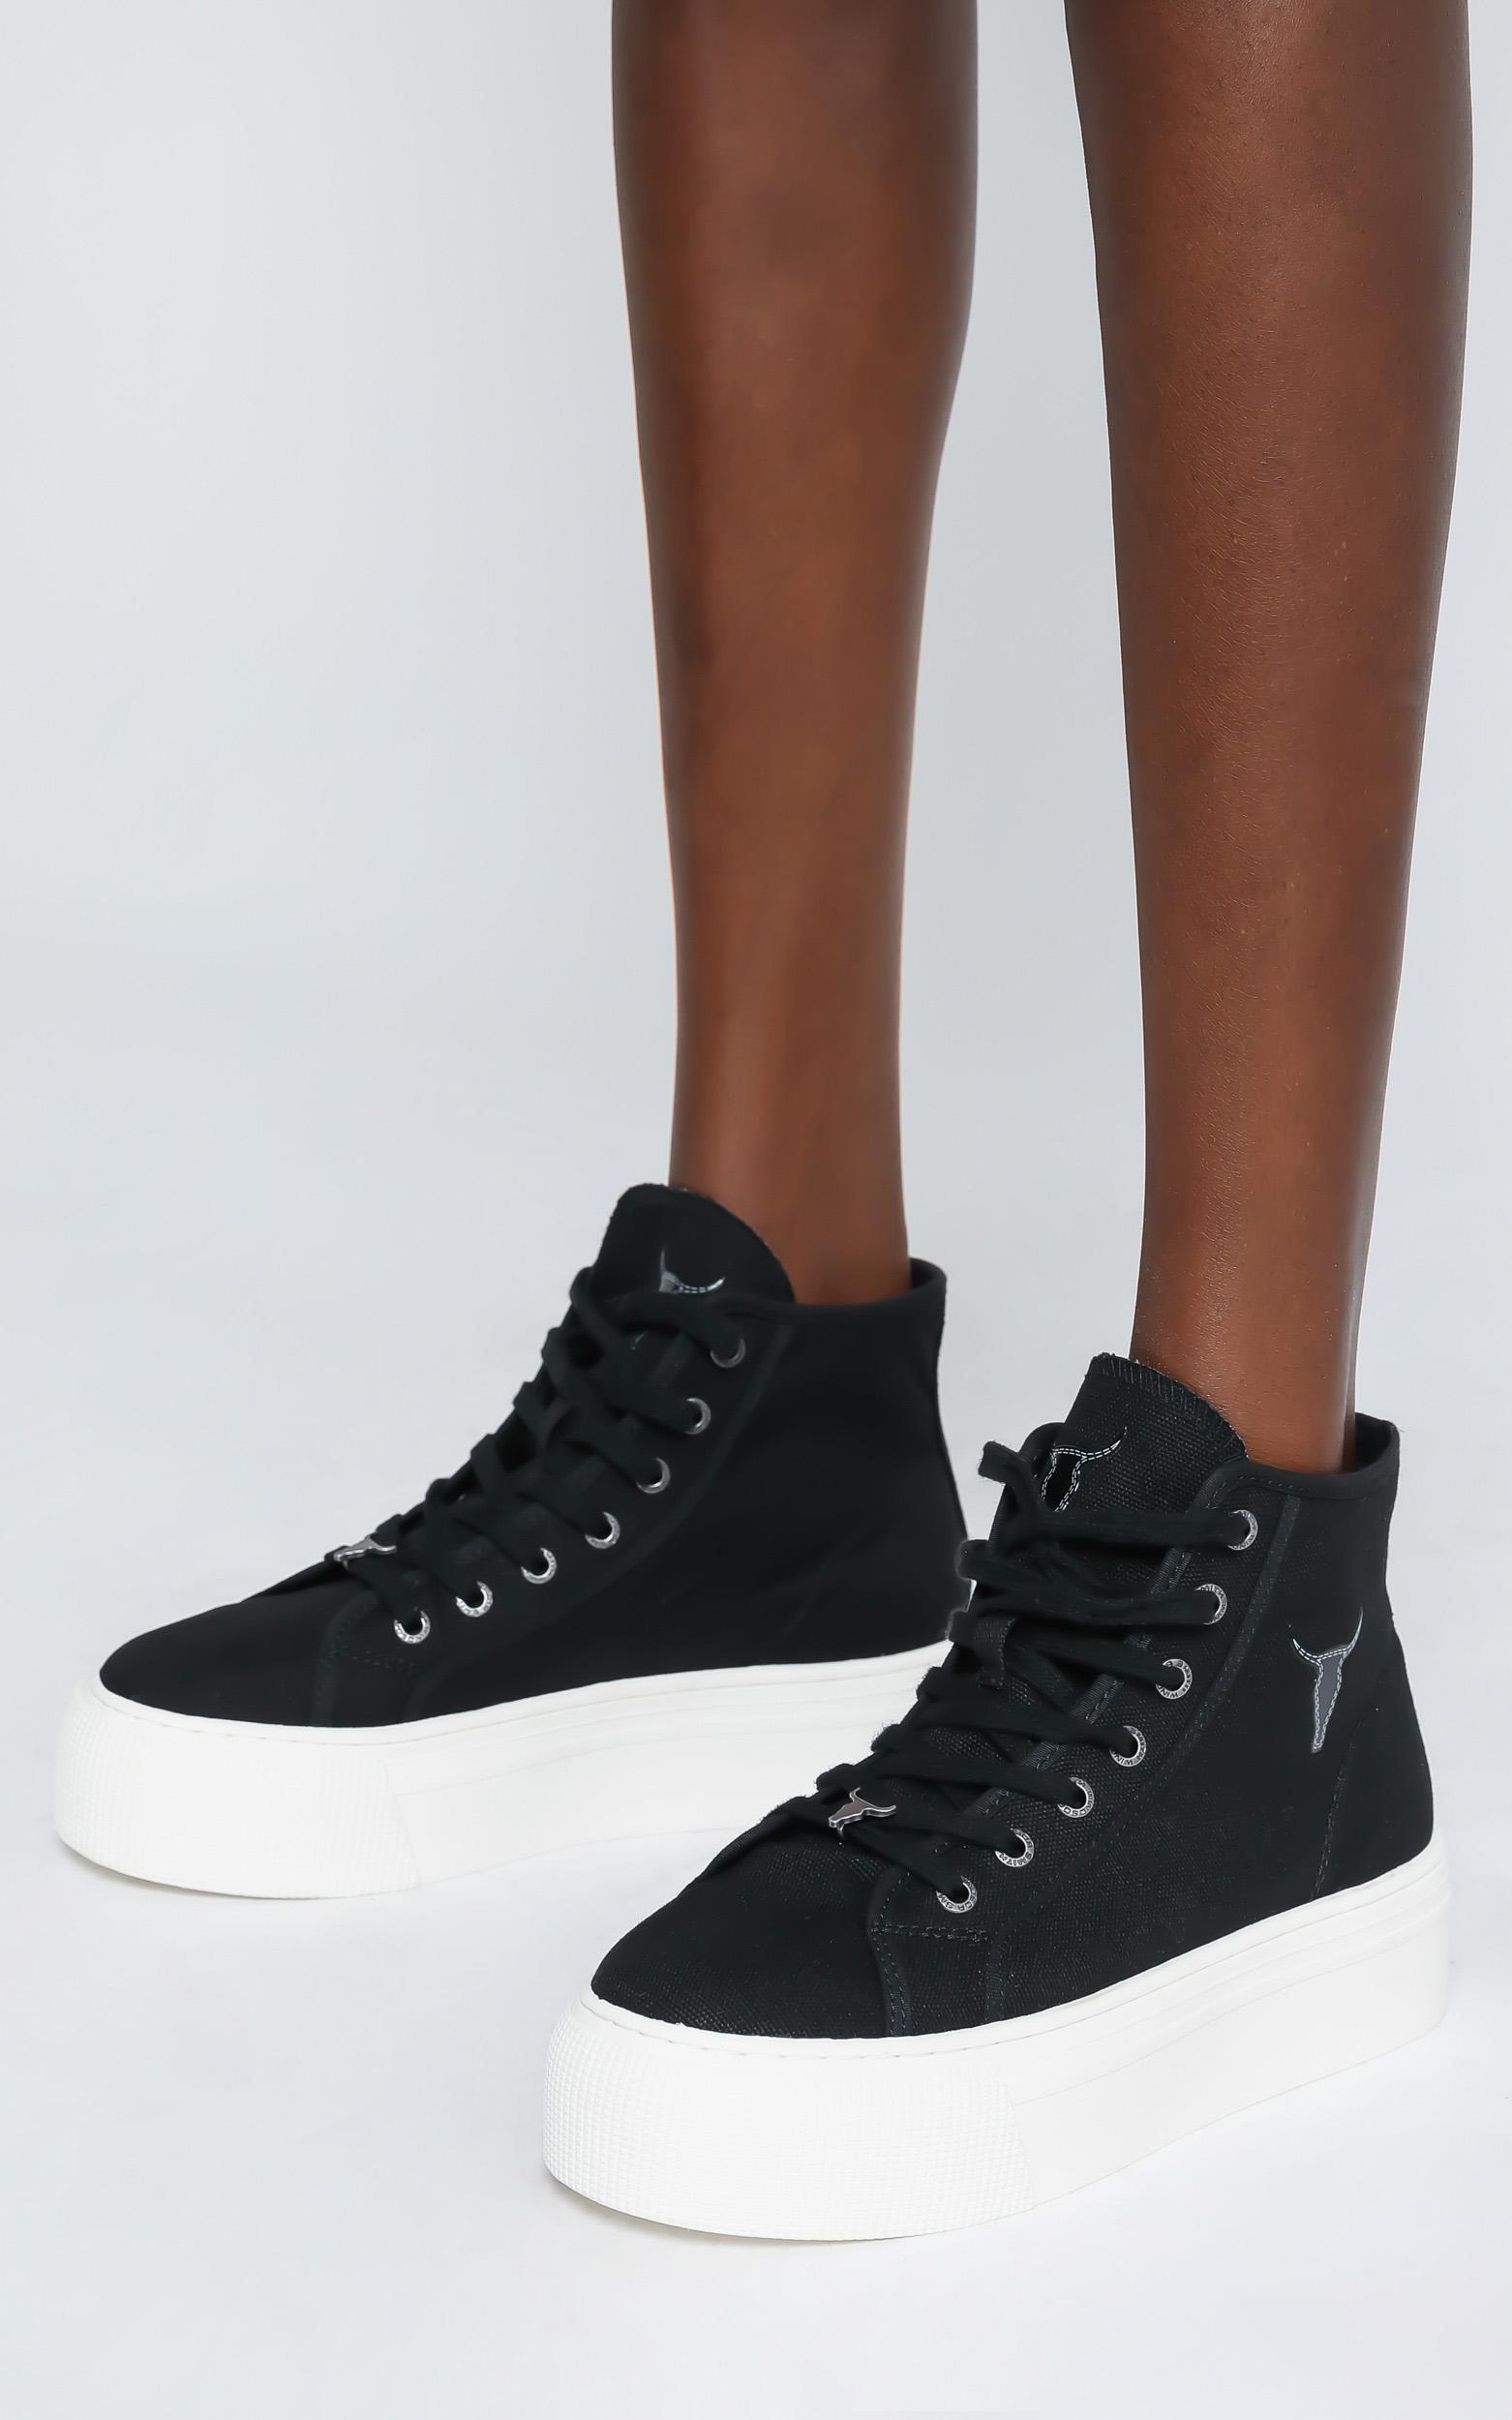 Windsor Smith - Runaway Sneakers in Black Canvas - 6, Black, hi-res image number null